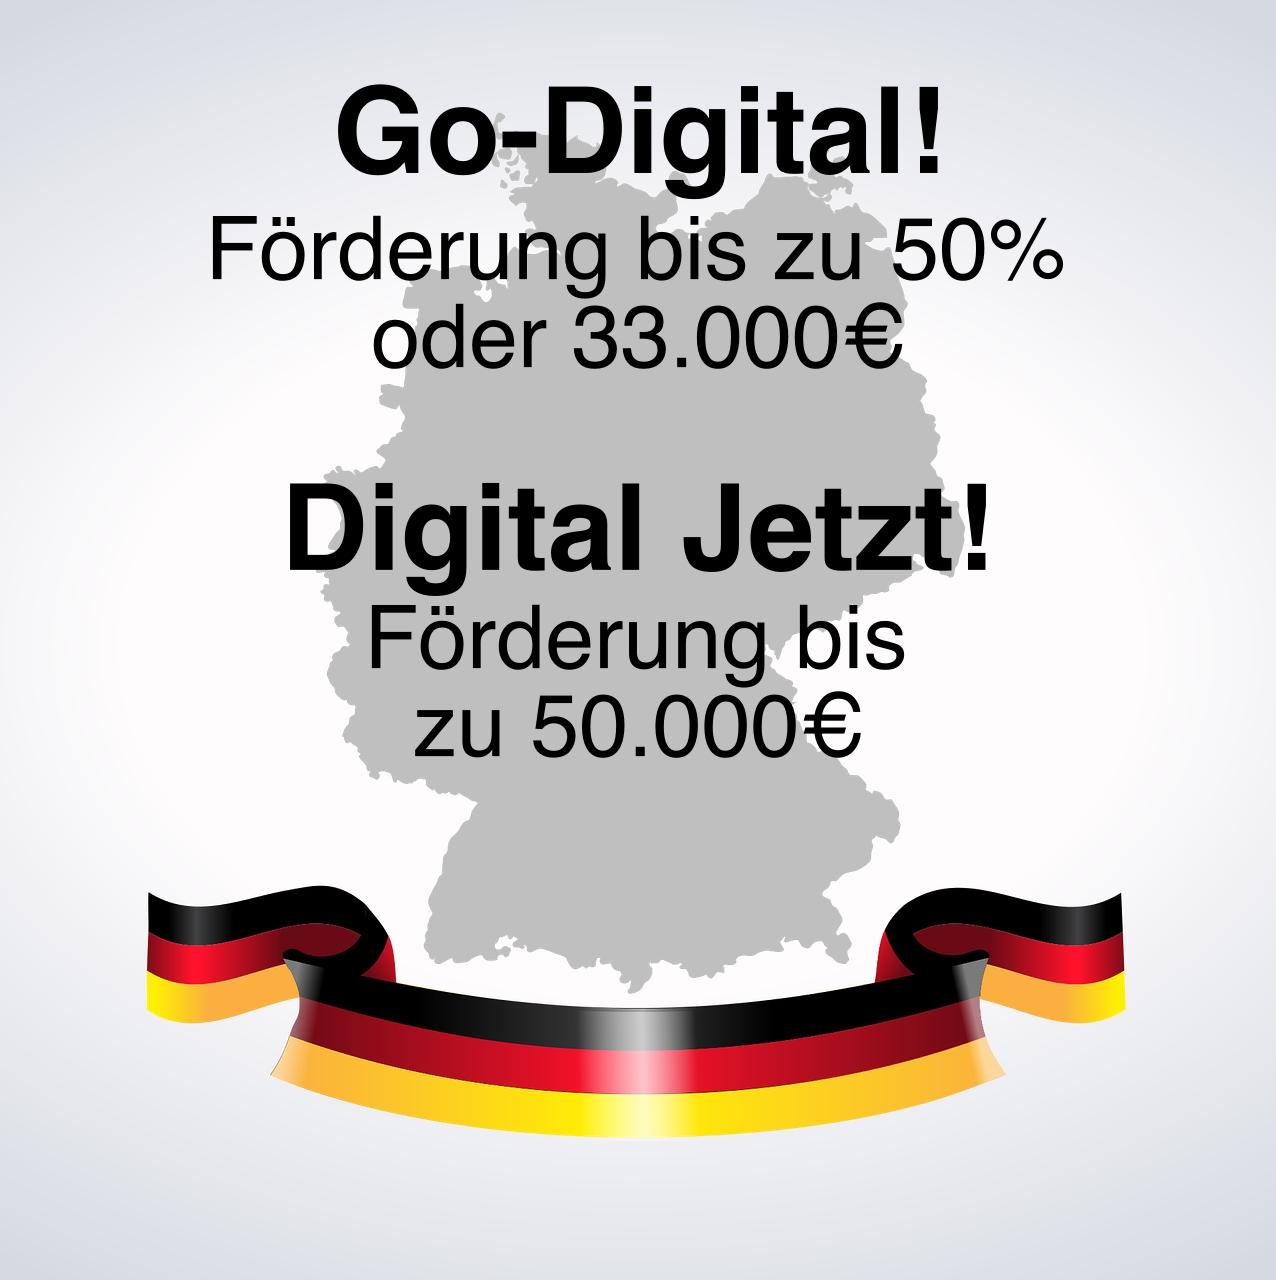 Go Digital Digital Jetzt